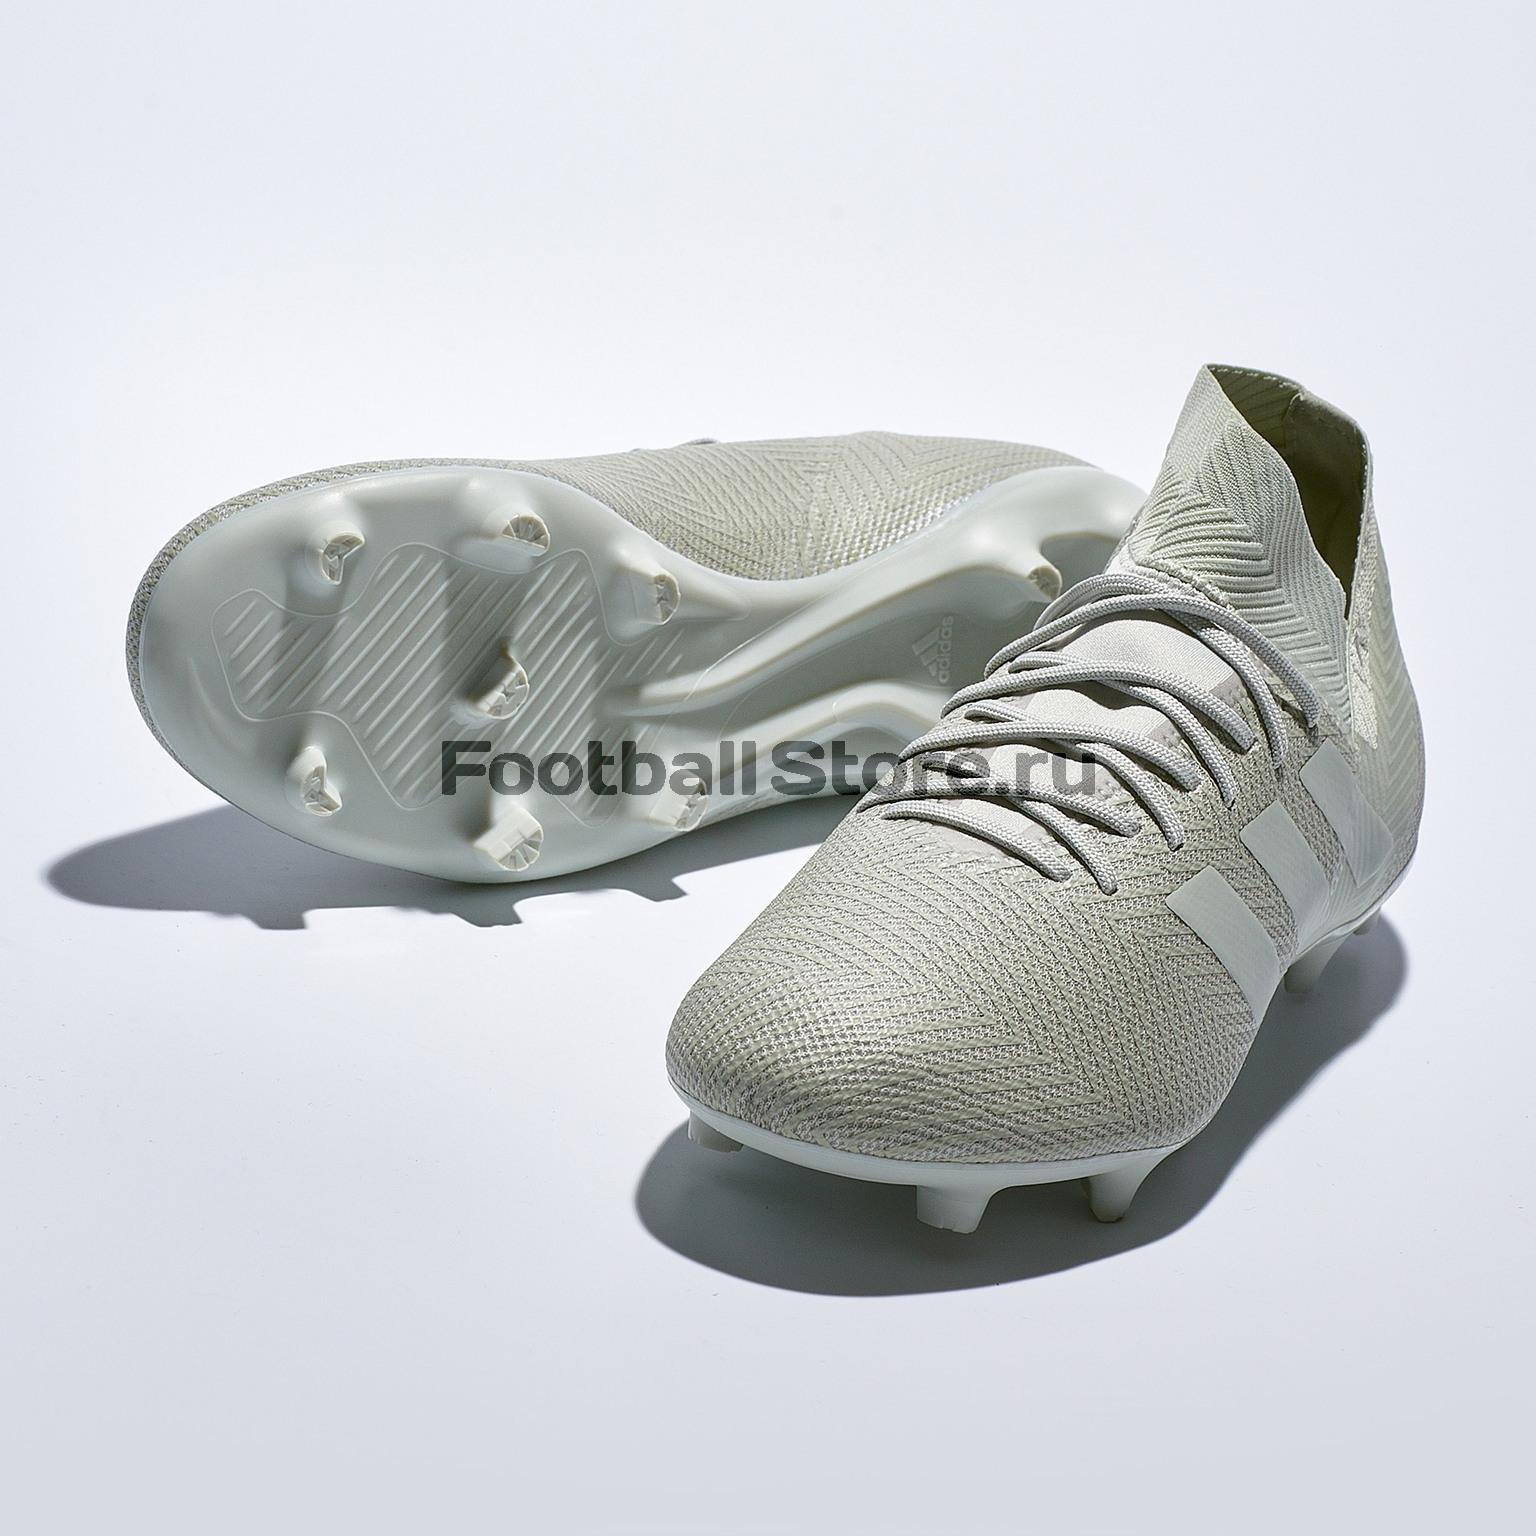 Бутсы Adidas Nemeziz 18.3 FG DB2110 игровые бутсы adidas бутсы adidas x 16 purechaos fg bb5615